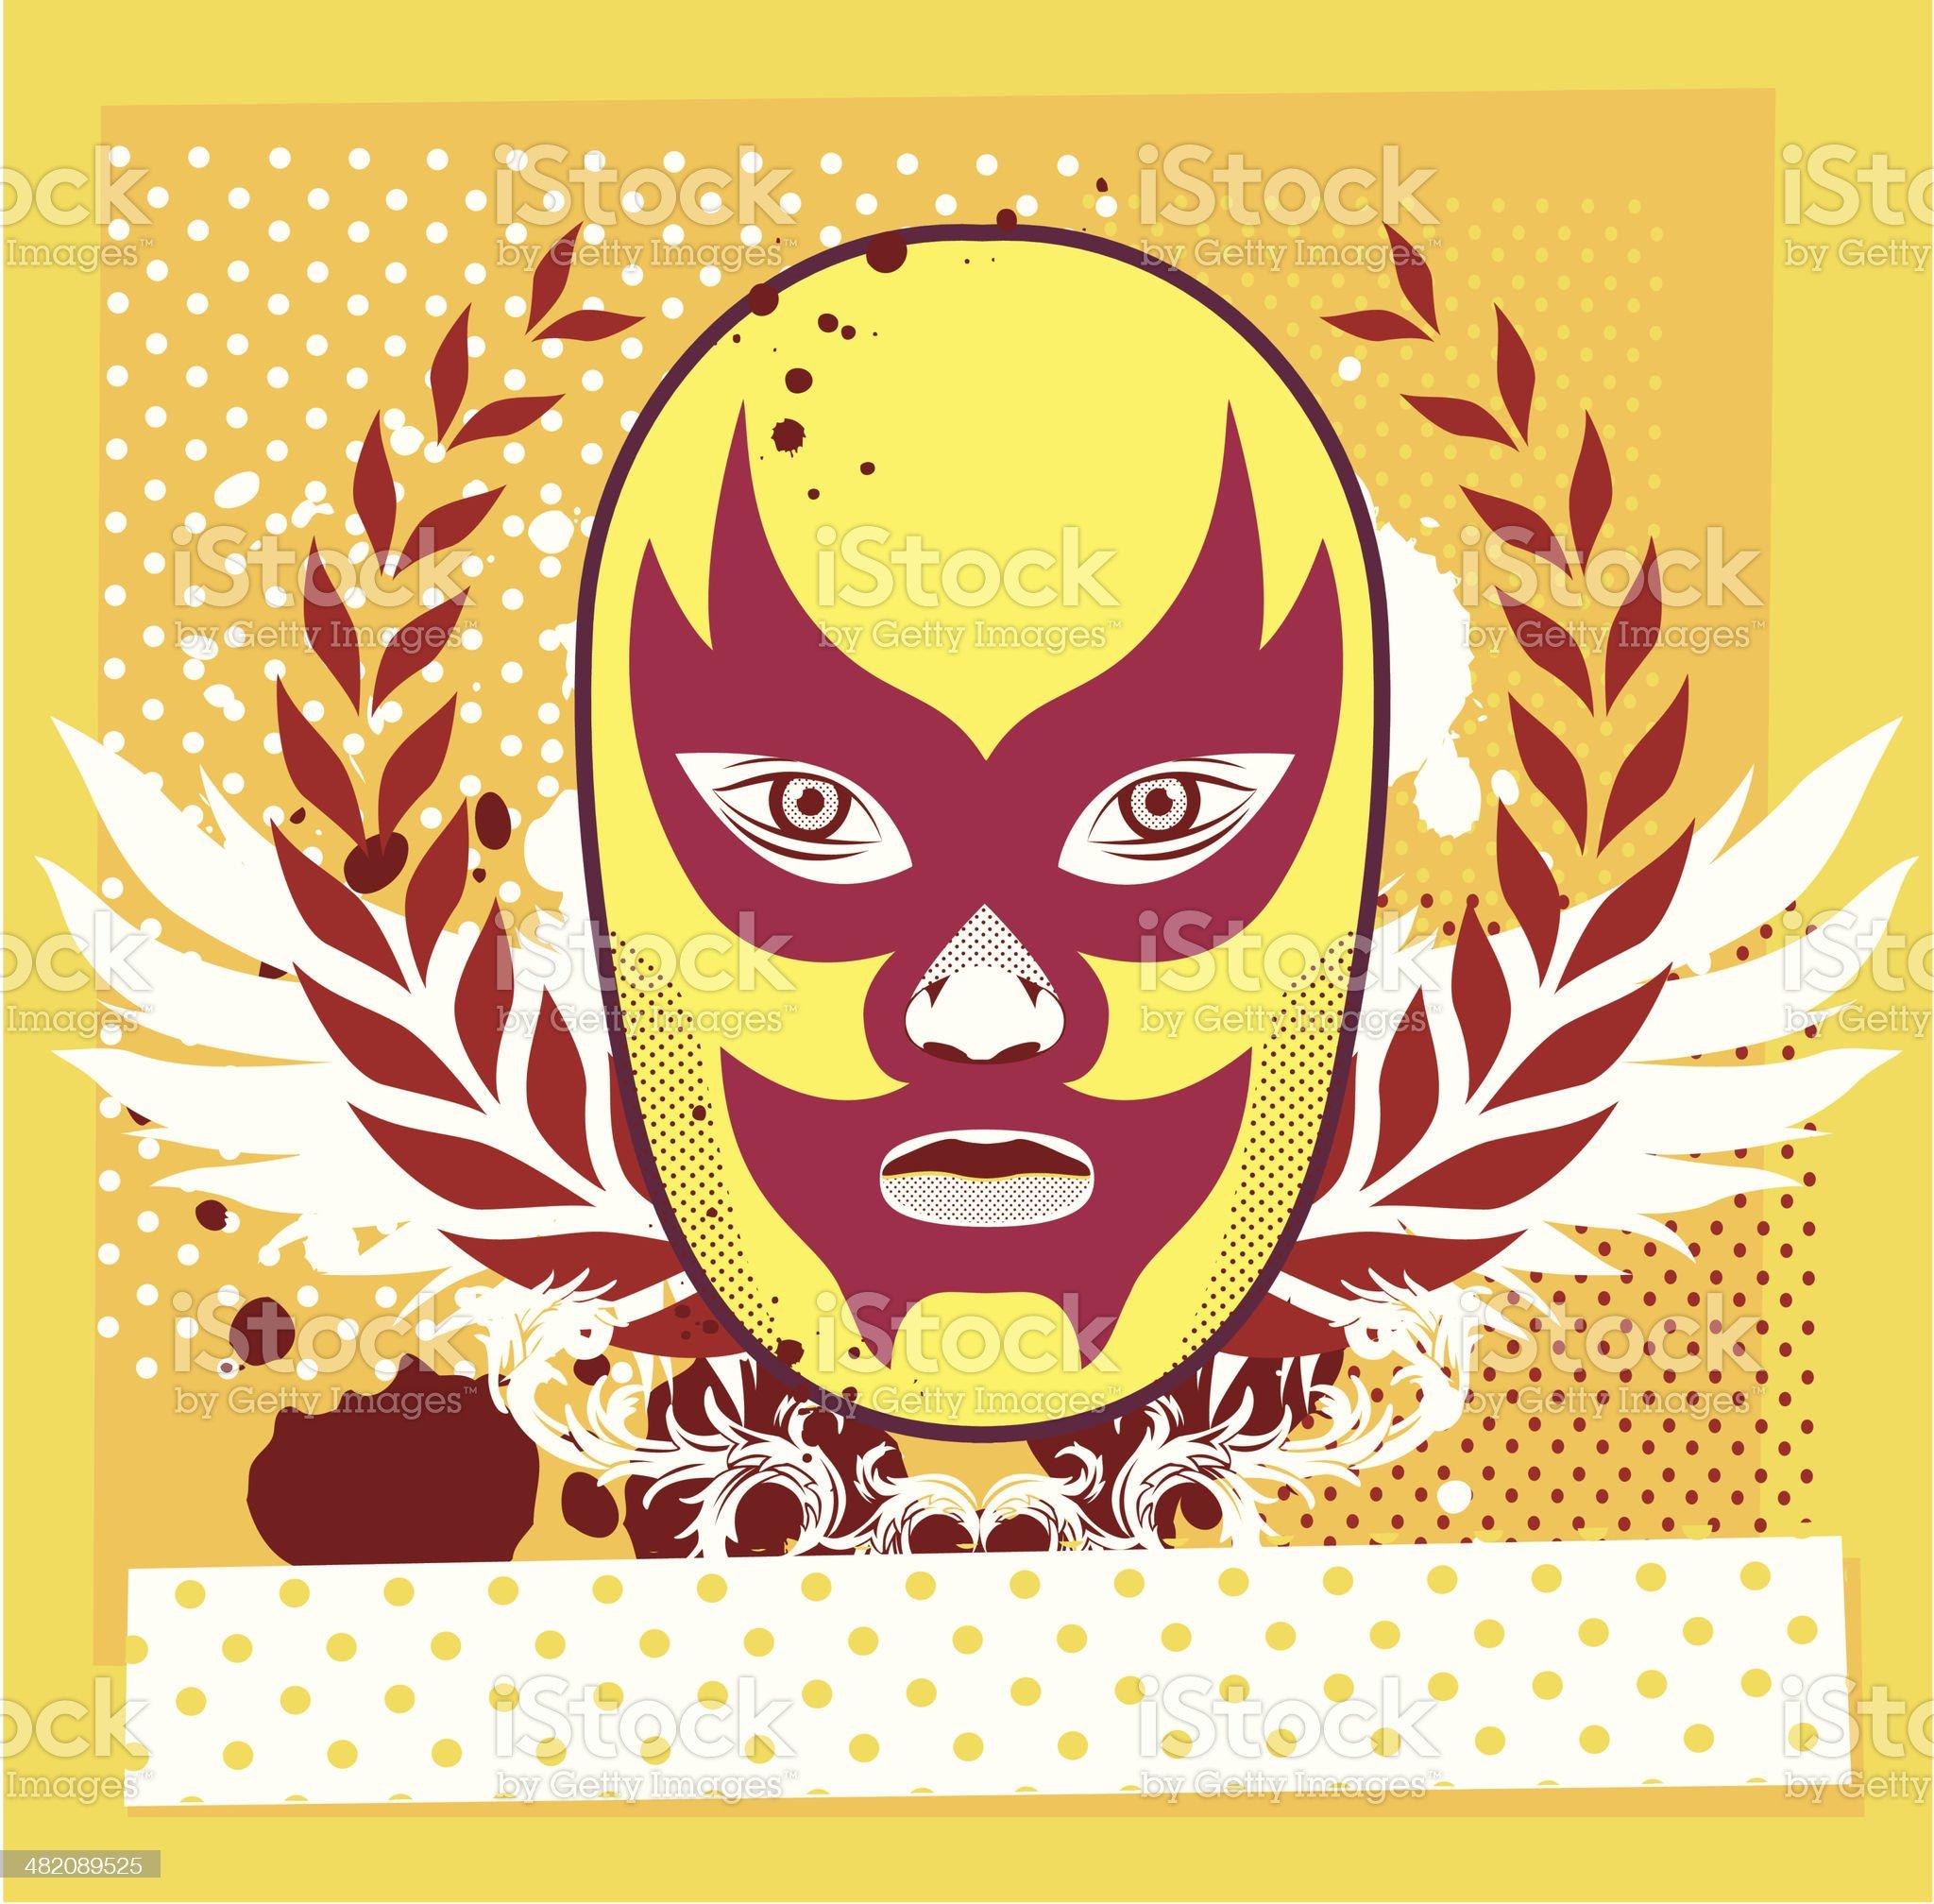 Wrestling royalty-free stock vector art